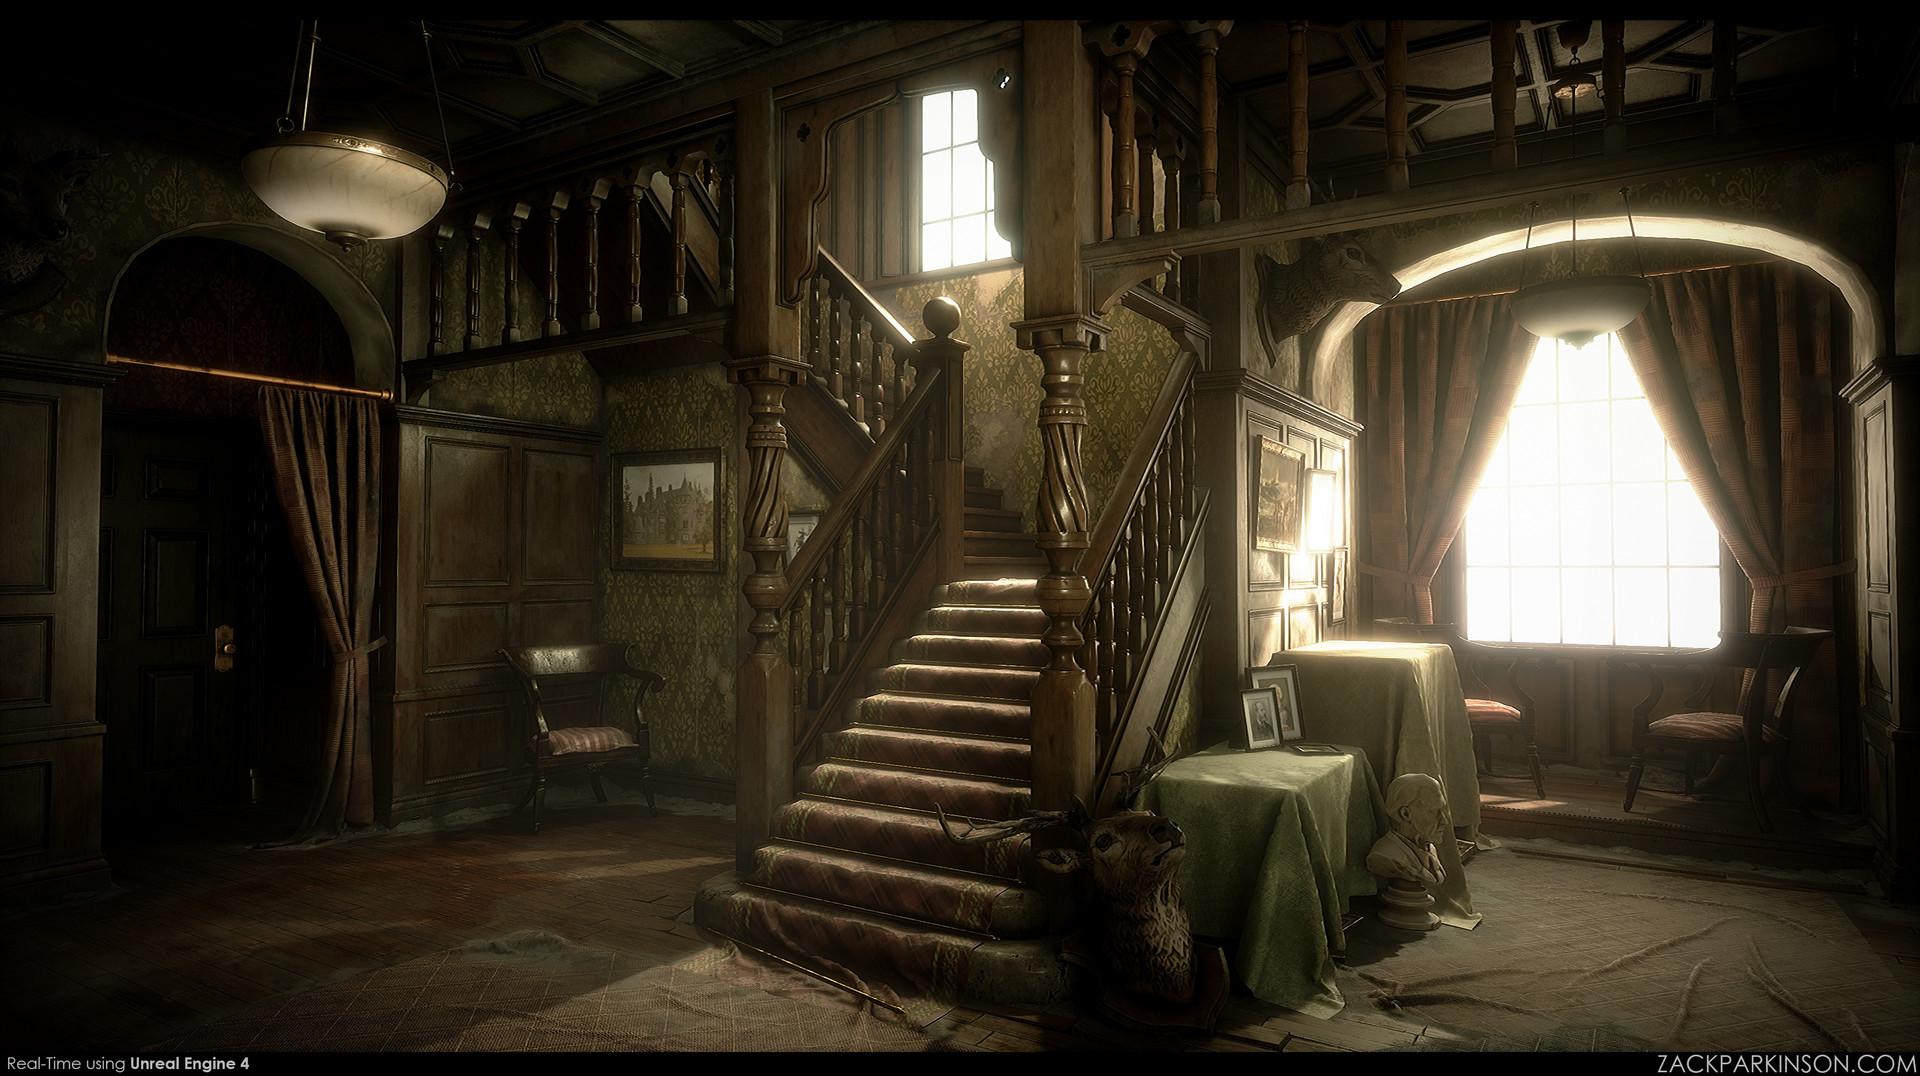 Wallpaper 3d Resident Evil 4 Artstation Abandoned Scottish Manor Zack Parkinson